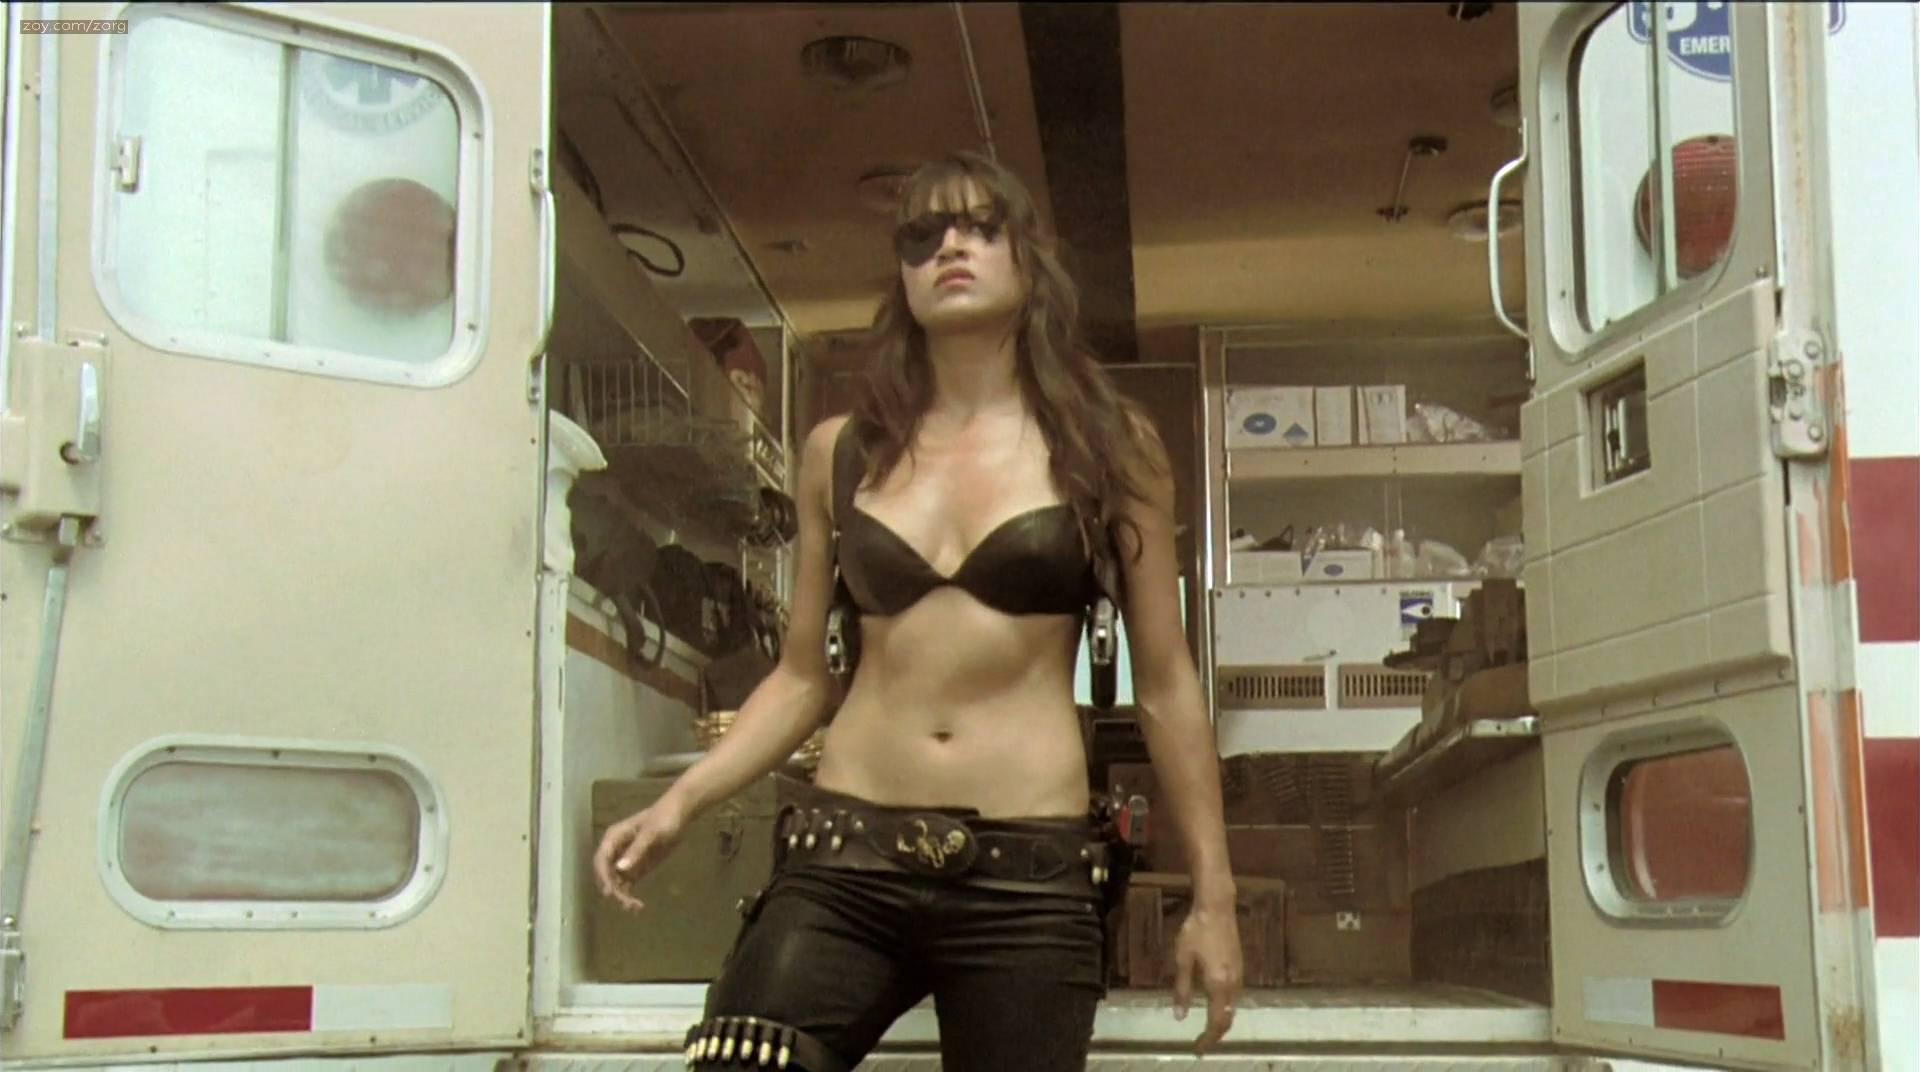 Nude Images Jennifer lawrence strip club footage